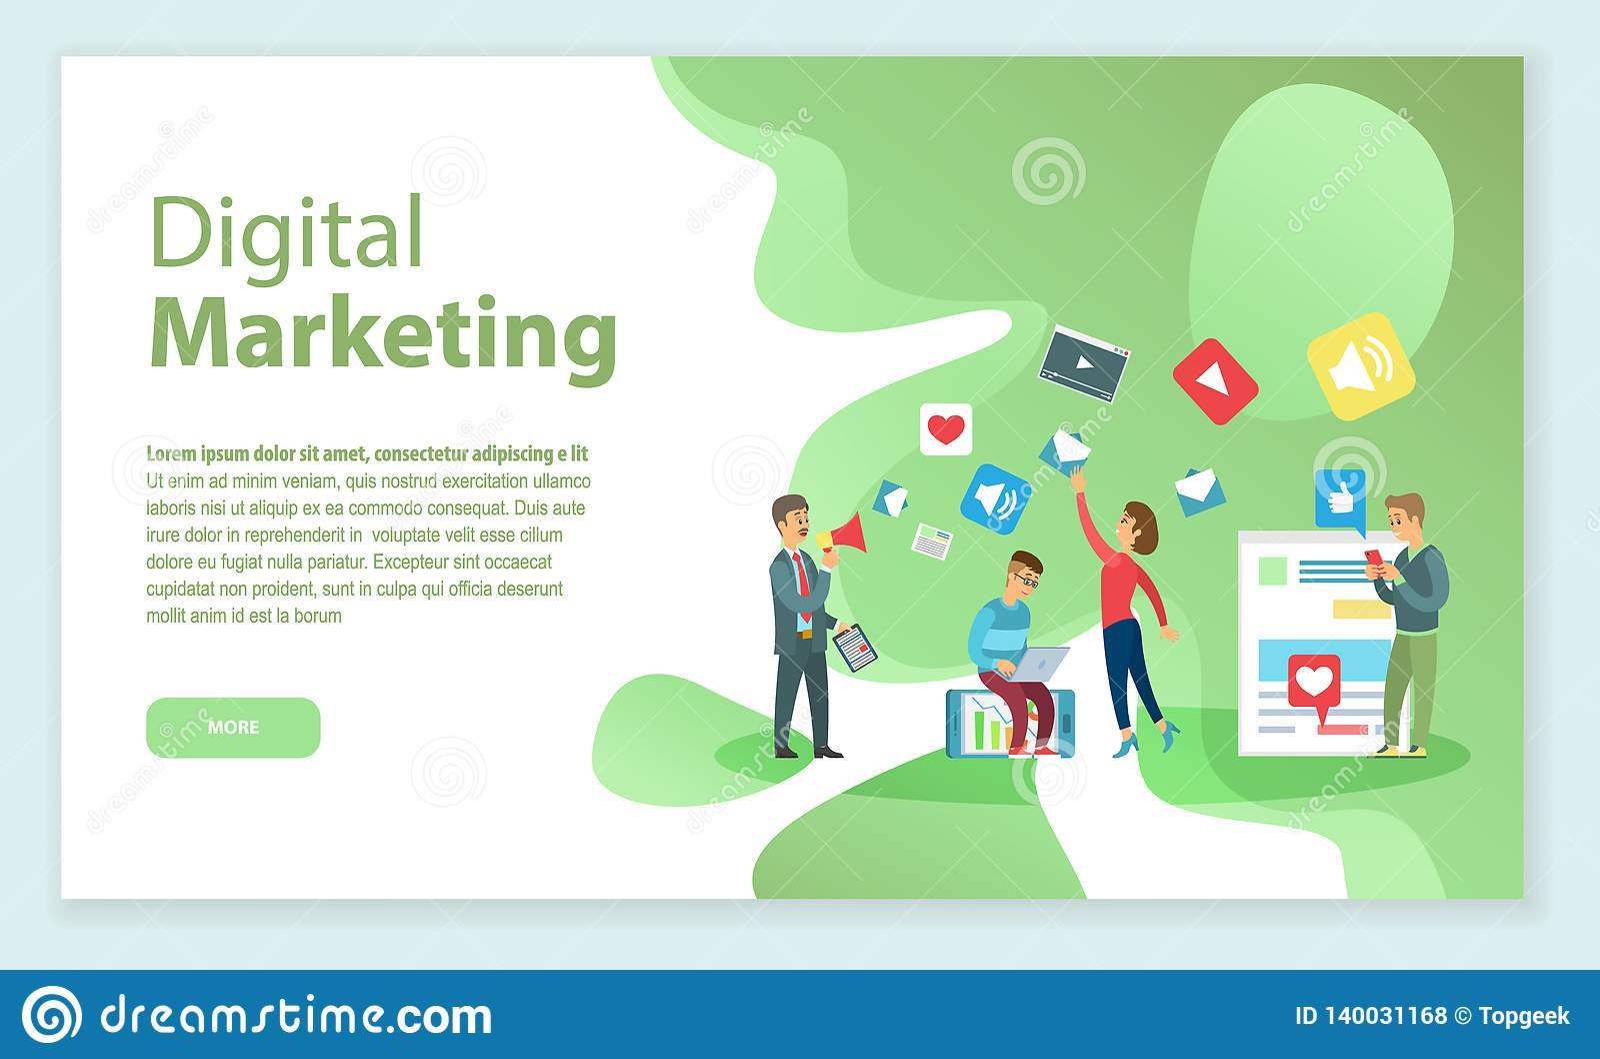 Digital Marketing People Working On Brand Name Stock Vector